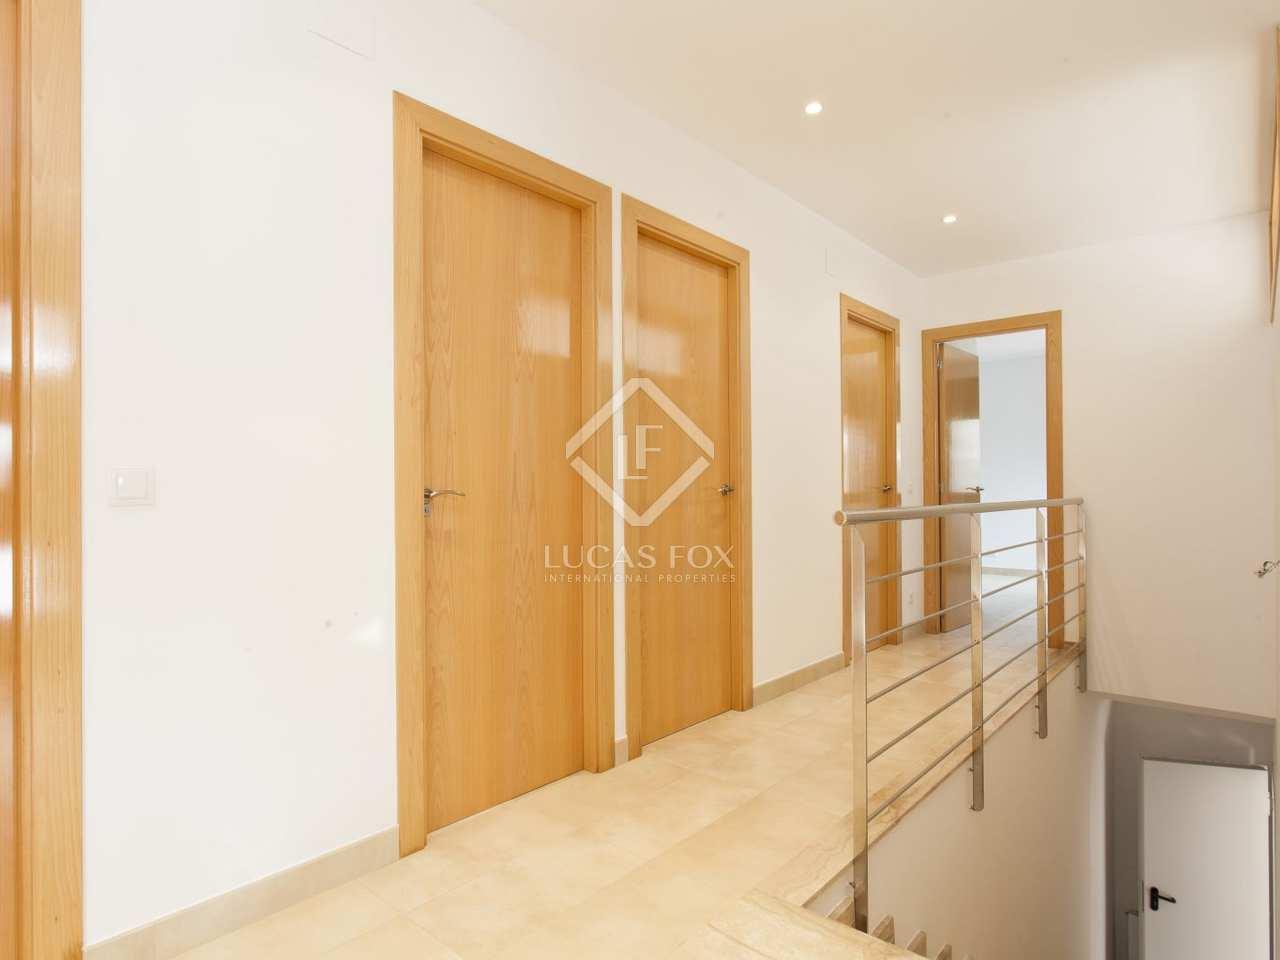 Casa moderna de 5 dormitorios en venta en olivella sitges for Casa moderna 4 dormitorios